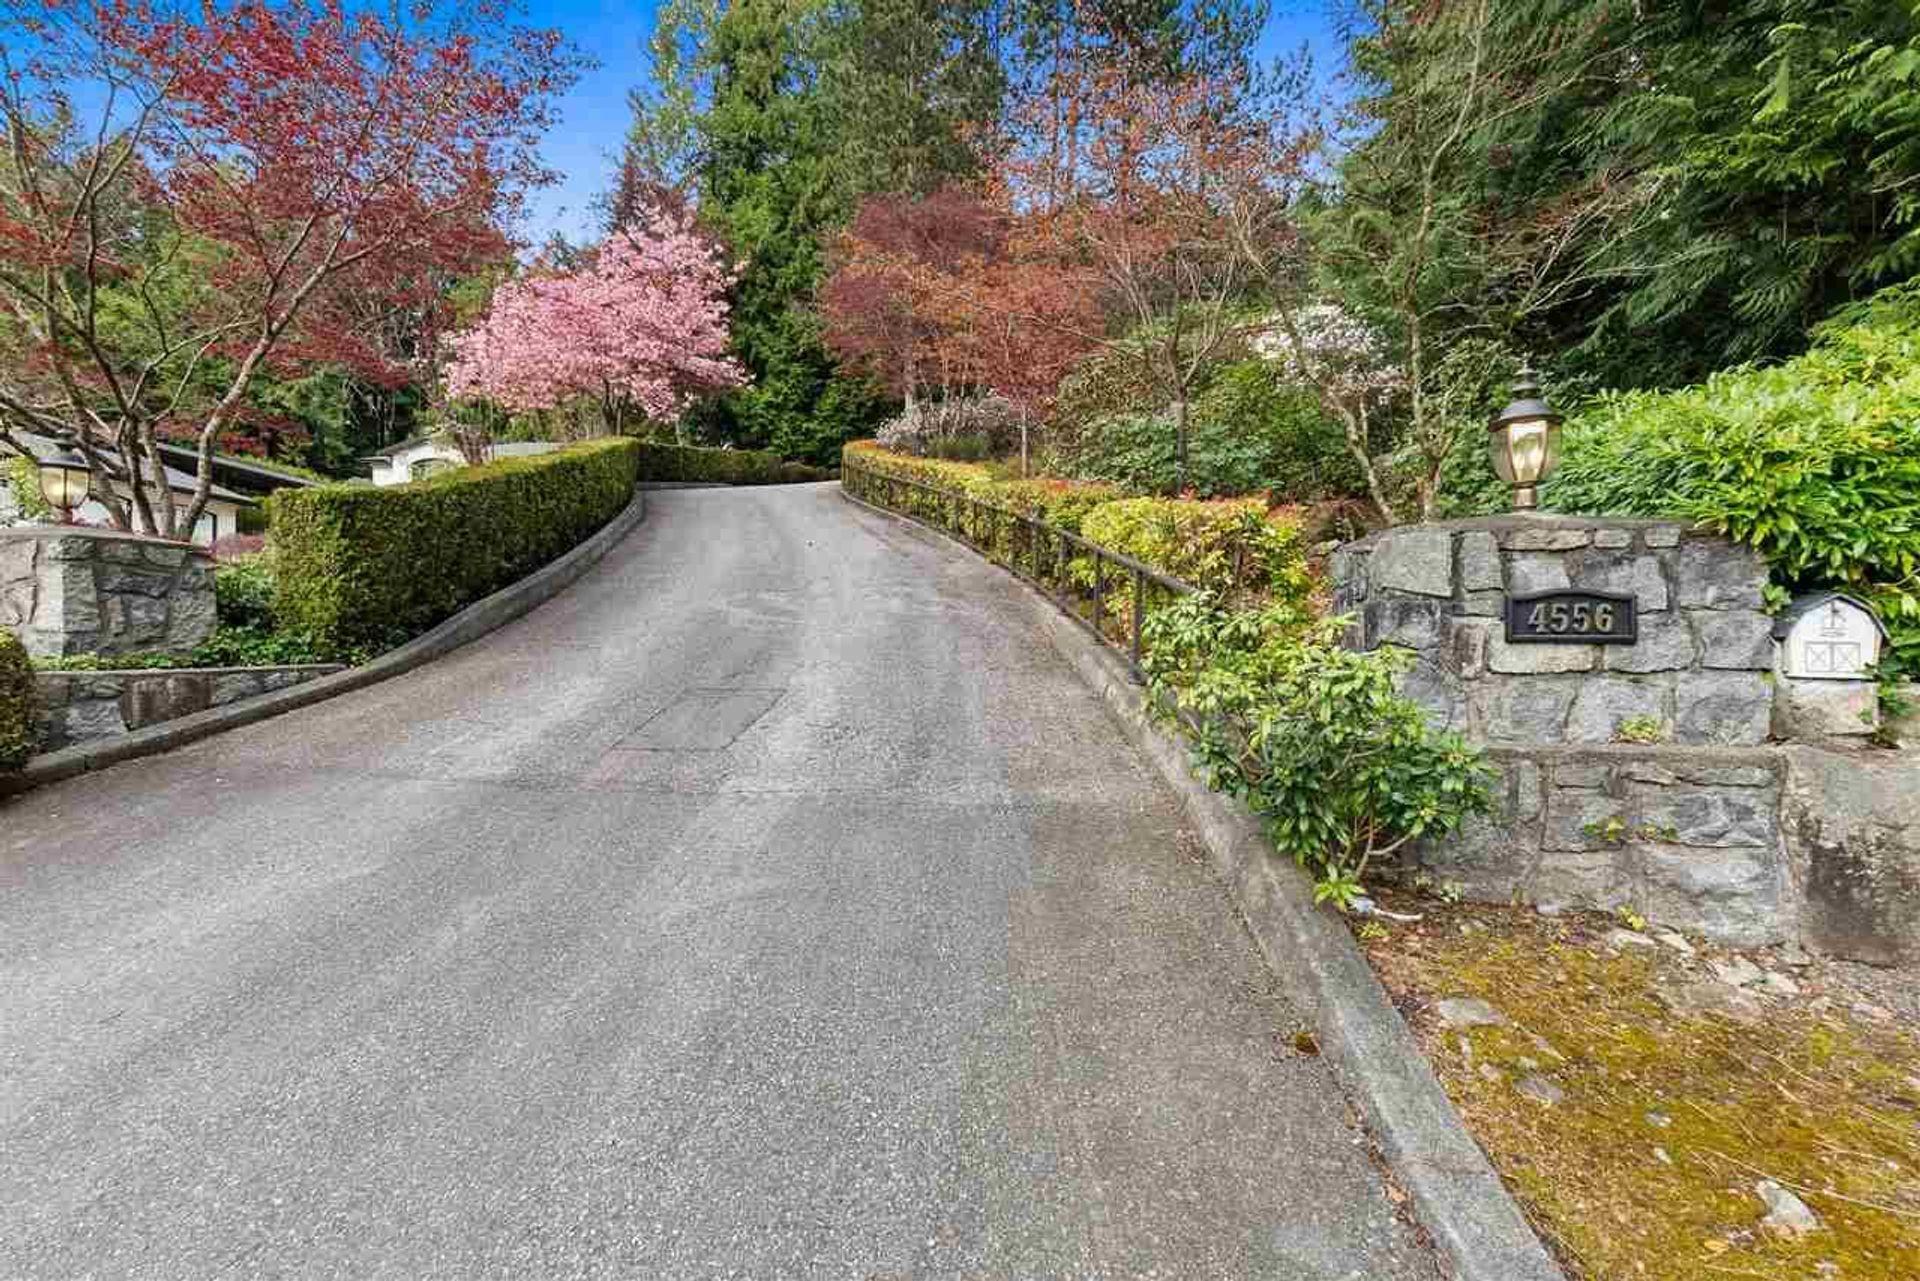 4556-woodgreen-drive-cypress-park-estates-west-vancouver-28 at 4556 Woodgreen Drive, Cypress Park Estates, West Vancouver